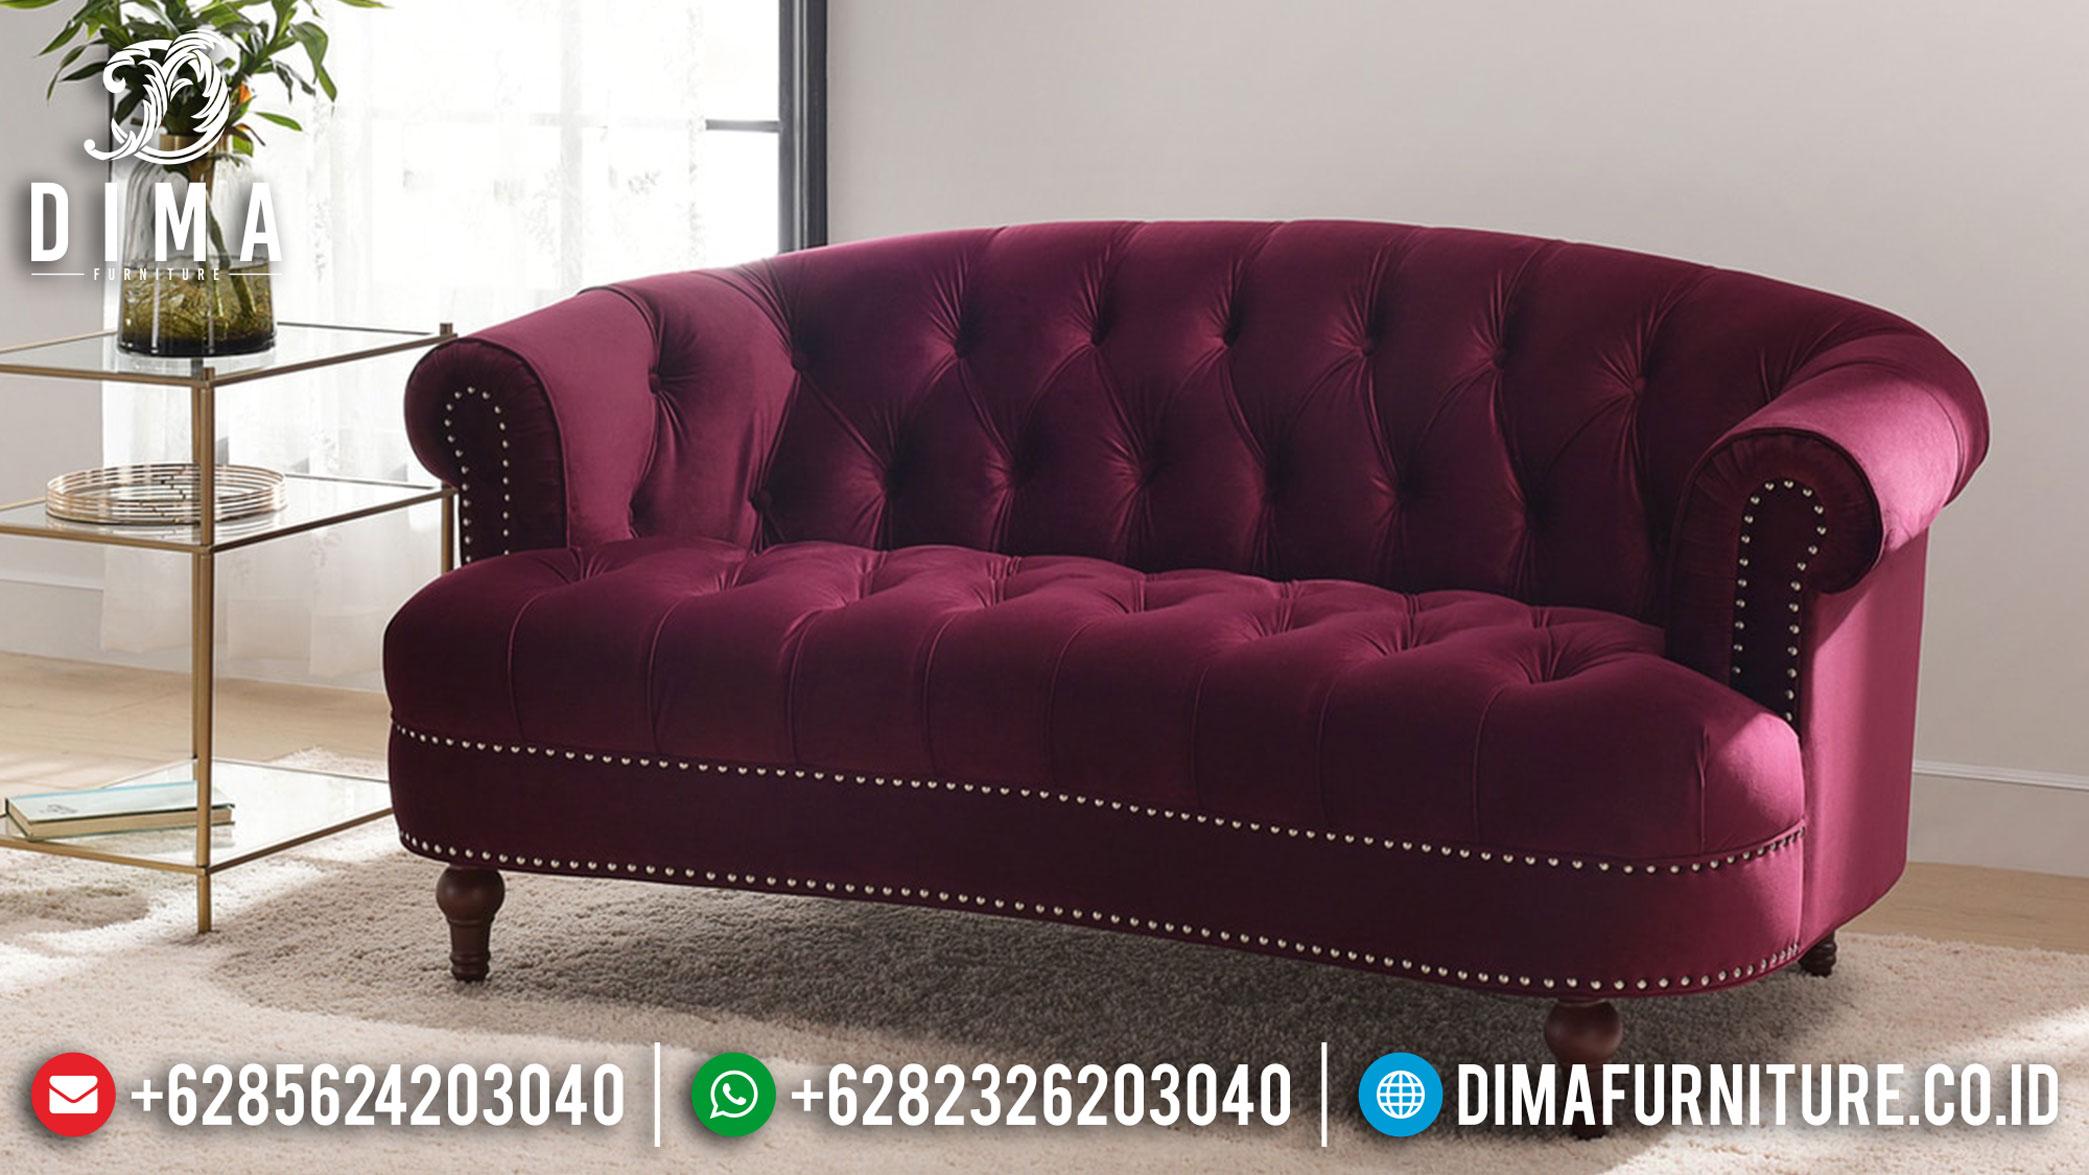 Sofa 3 Dudukan Minimalis Jepara Desain Chester Great Quality Solid Wood BT-0862